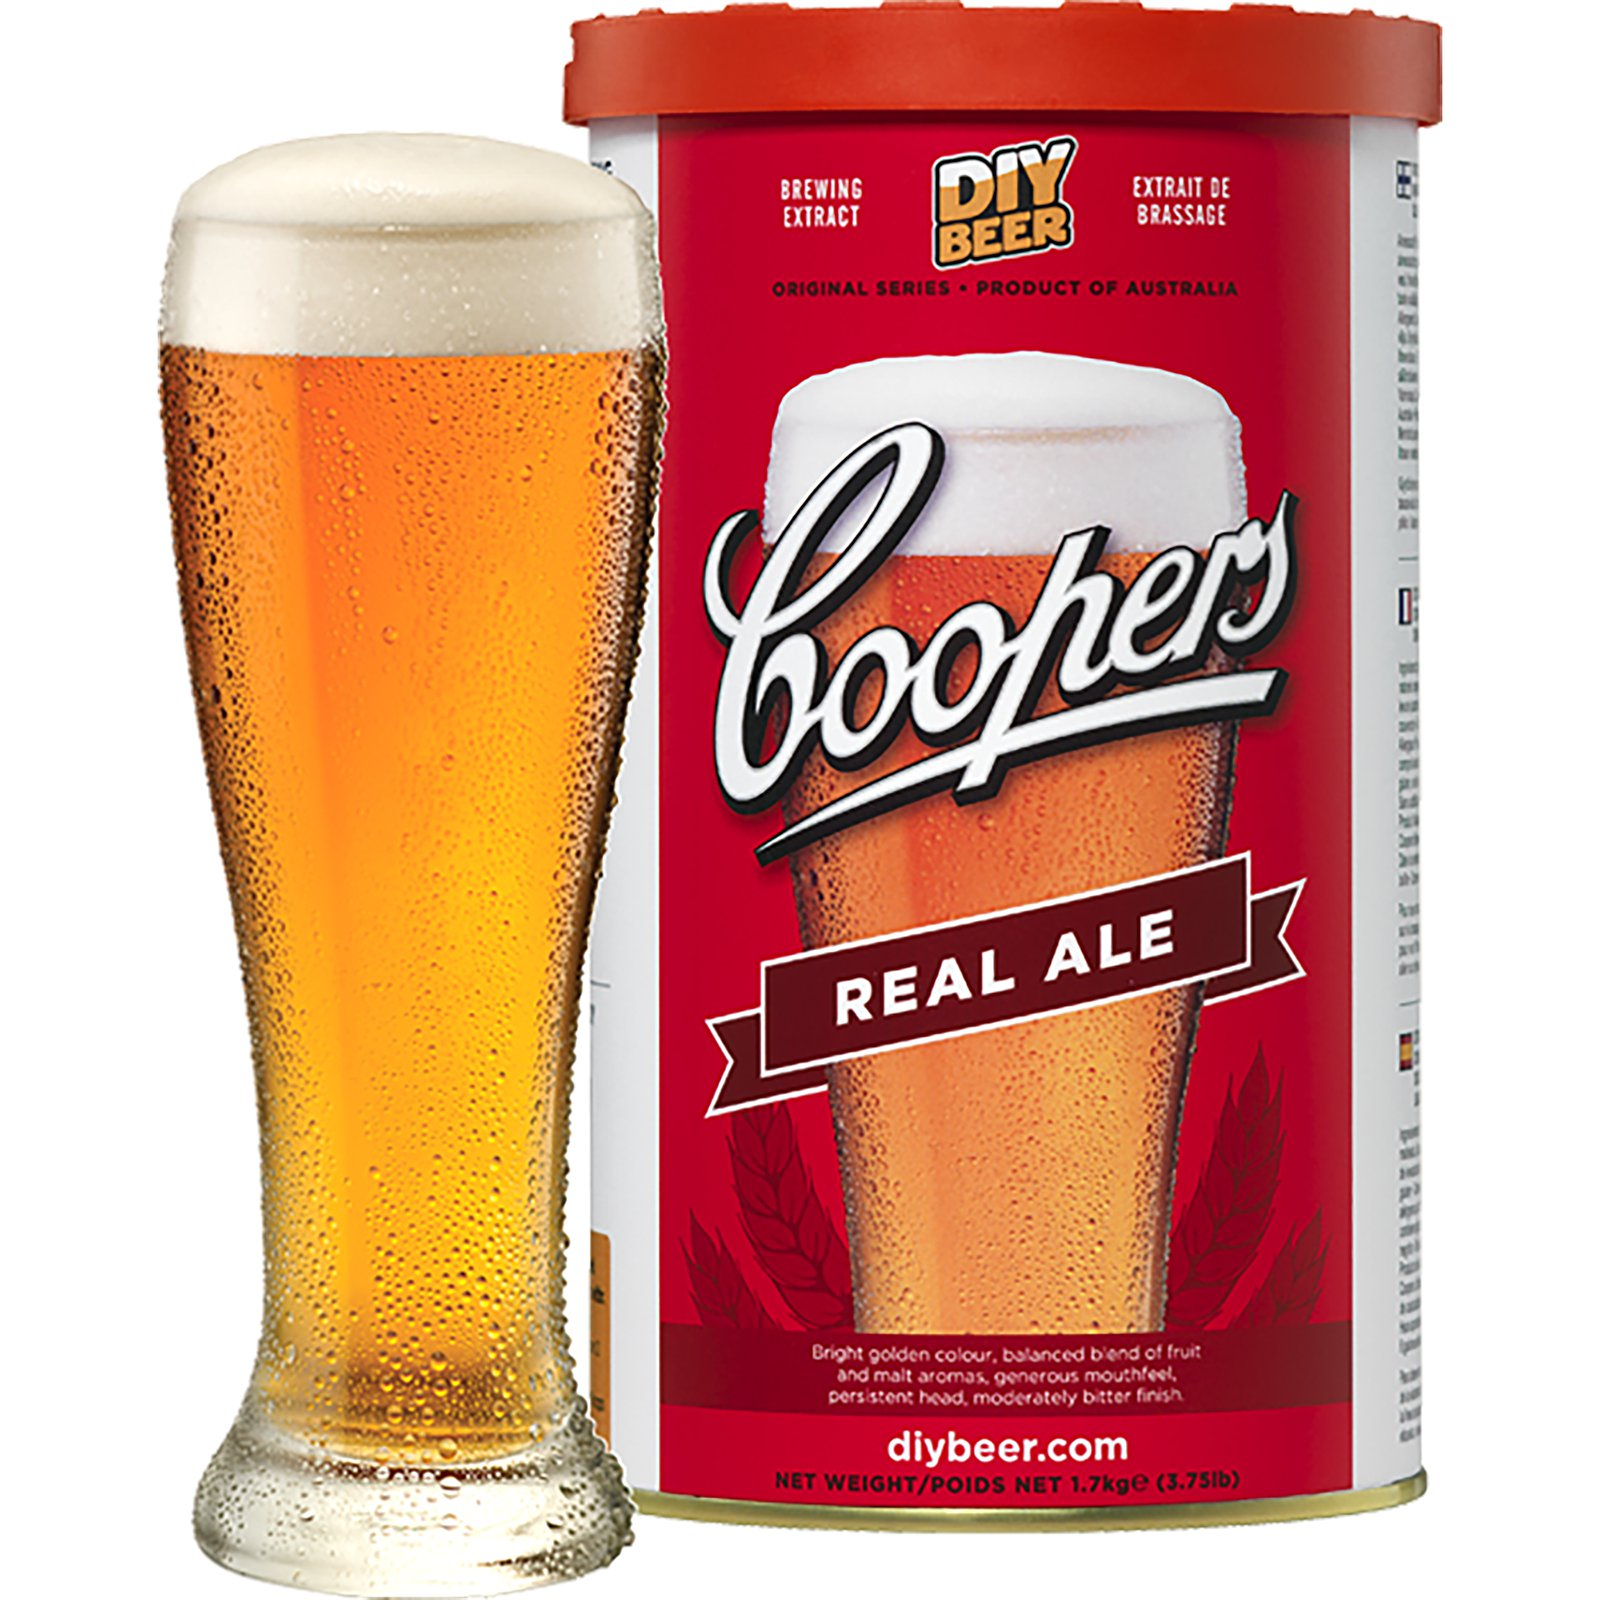 ДОМАШНИЕ ПИВО BREWKIT COOPERS Real Ale + дрожжи 23л